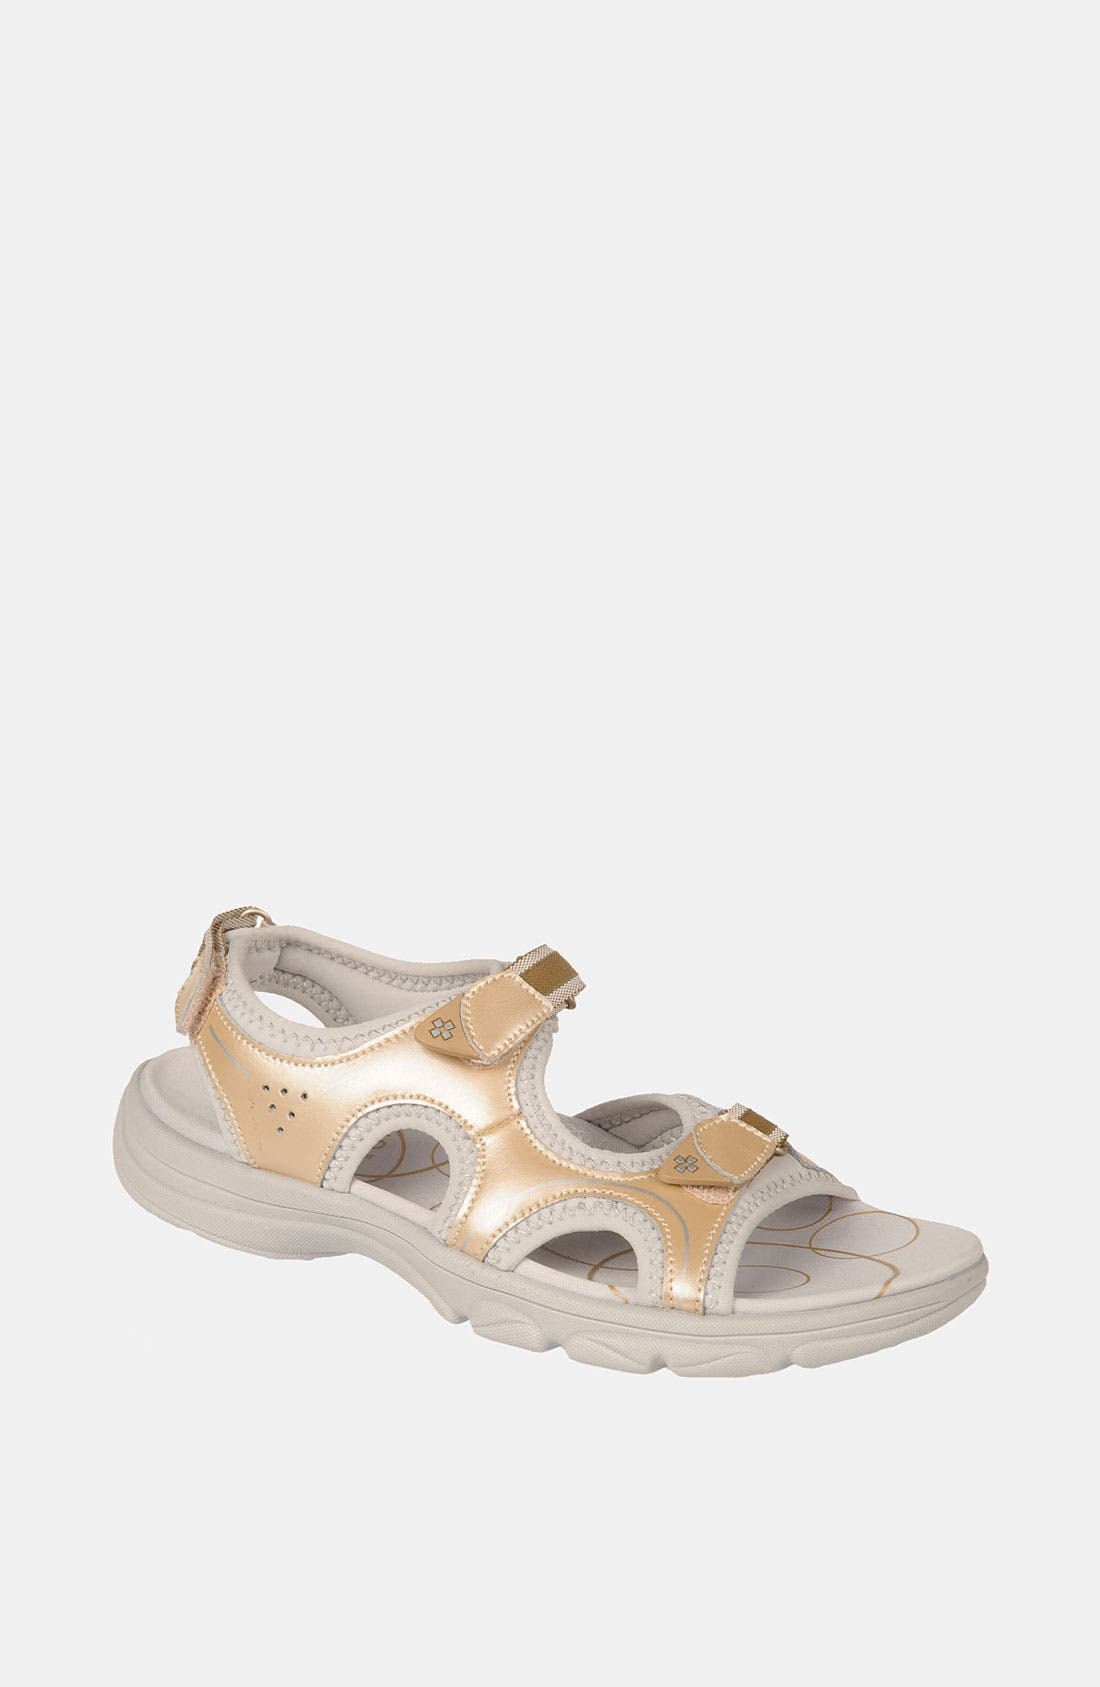 Alternate Image 1 Selected - Naturalizer 'BZees Beach' Sandal